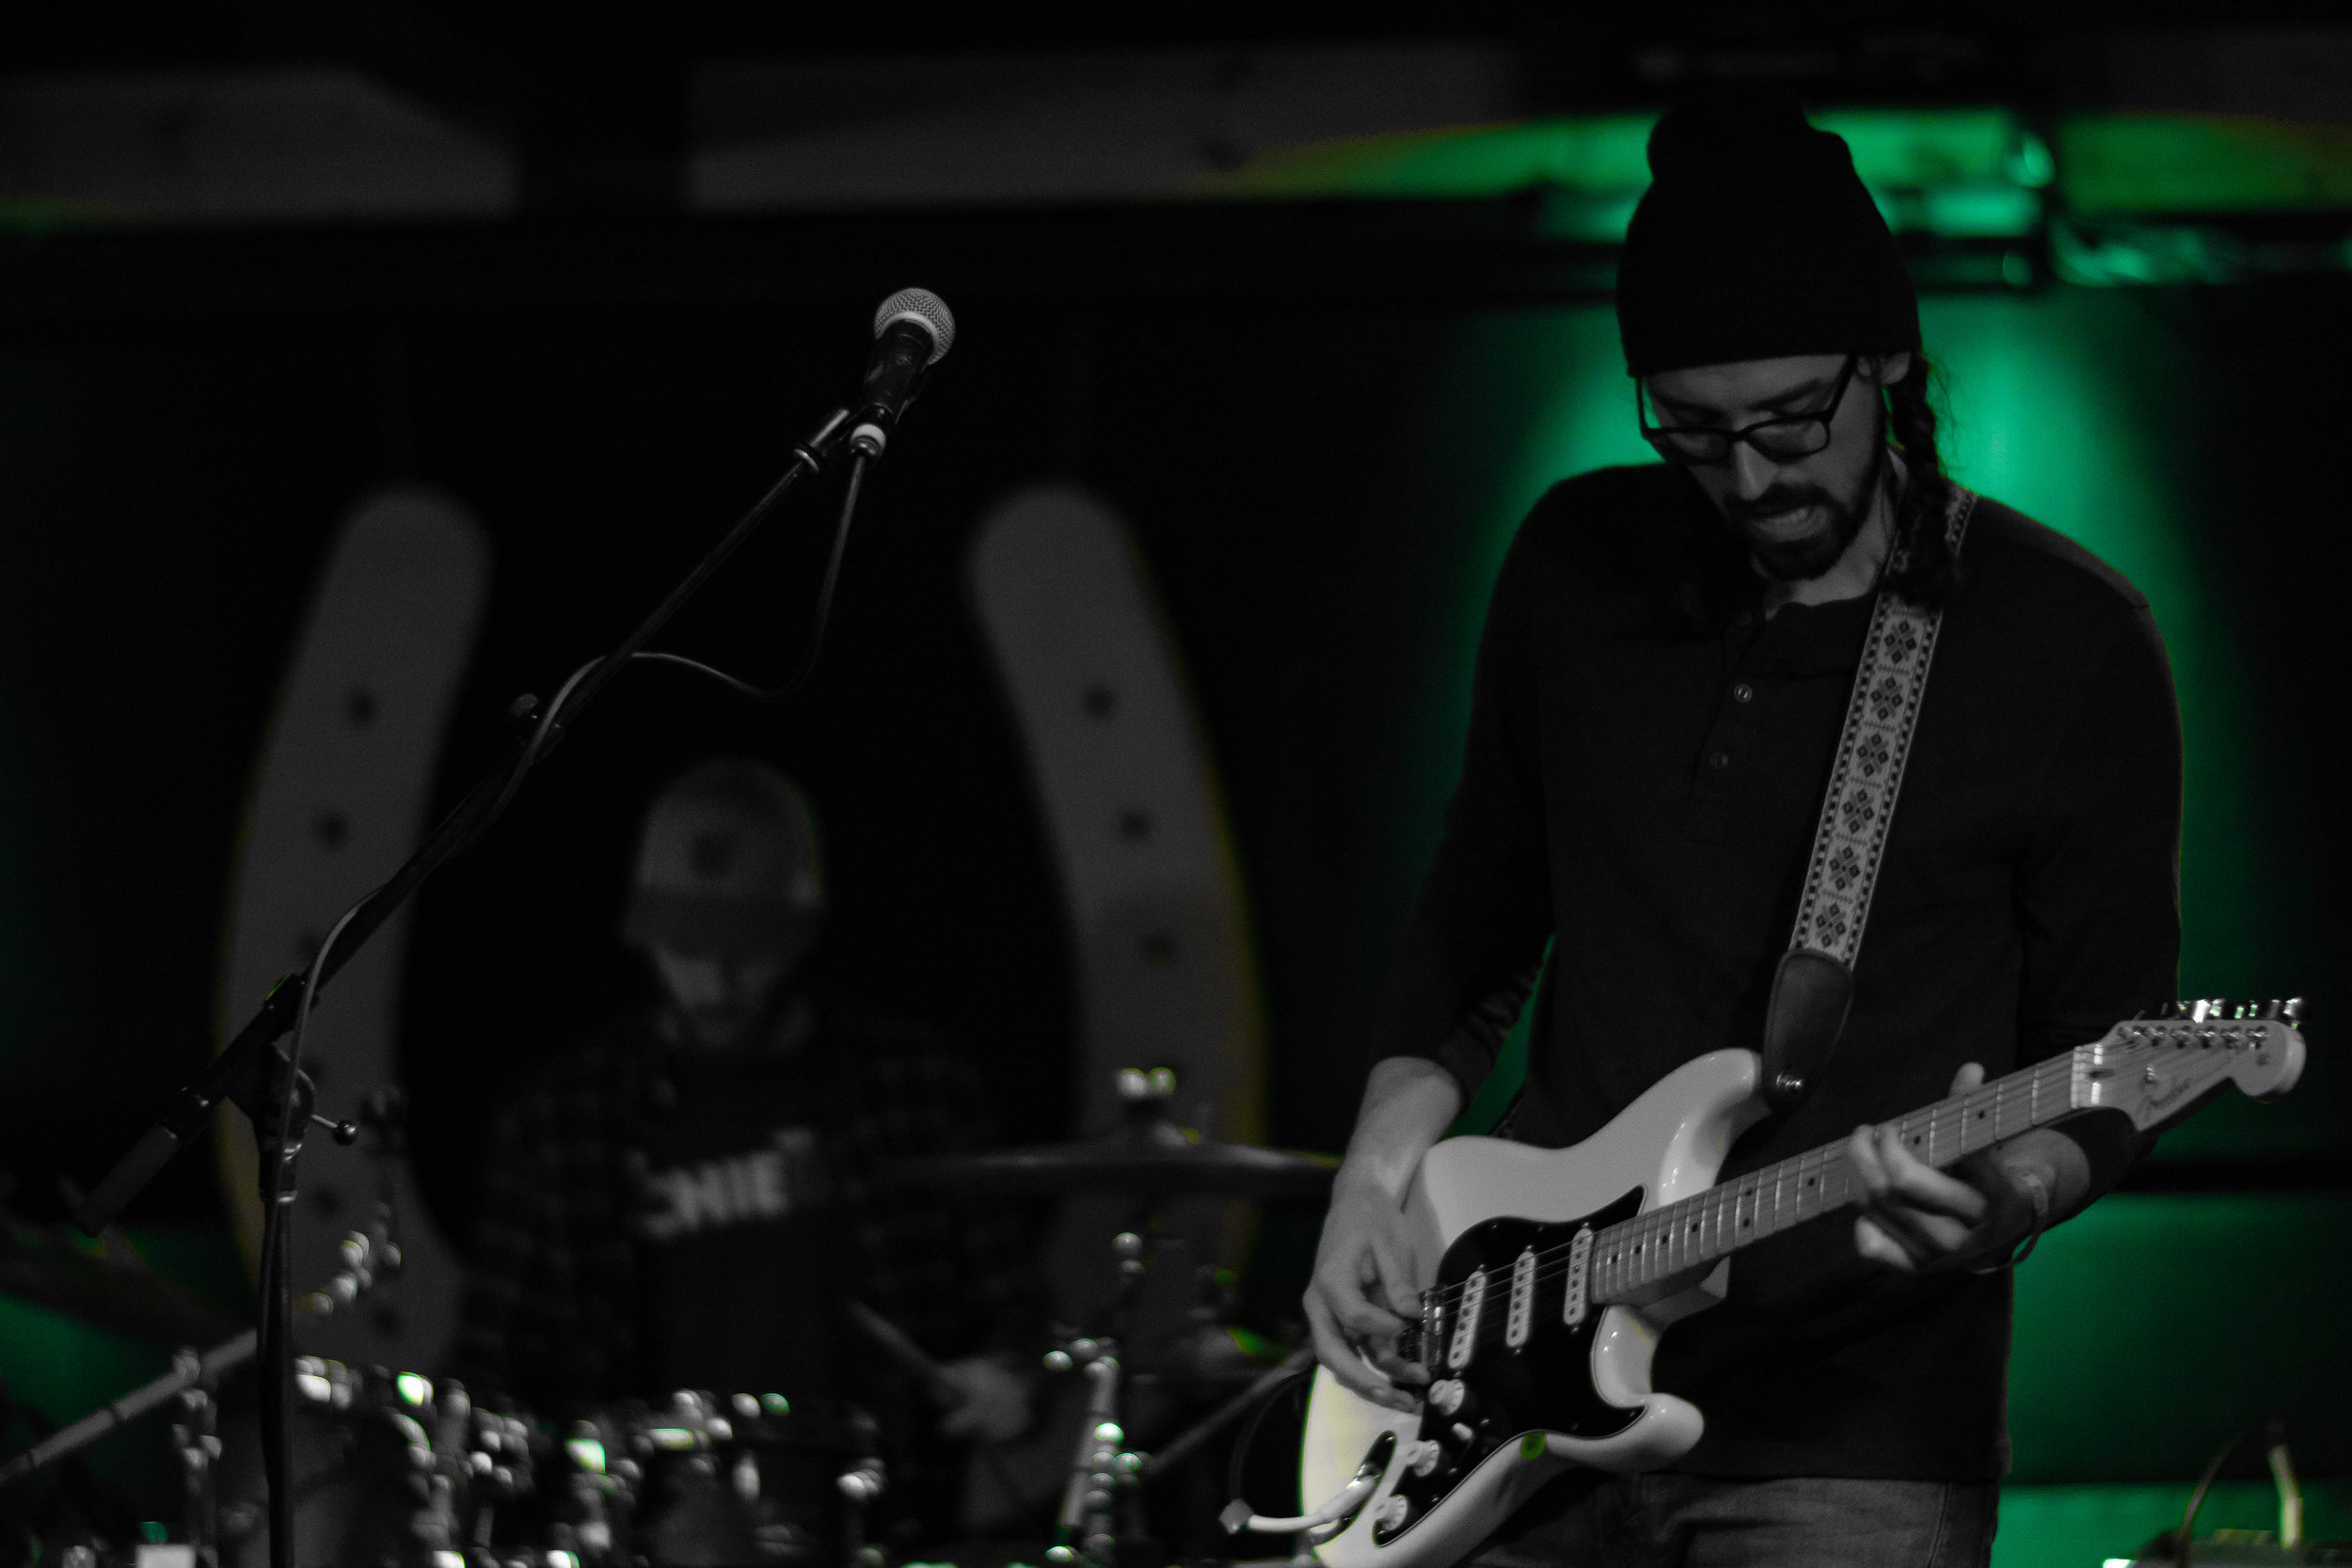 Live at The Golden Pony - 3.14.18 - Harrisonburg, VA